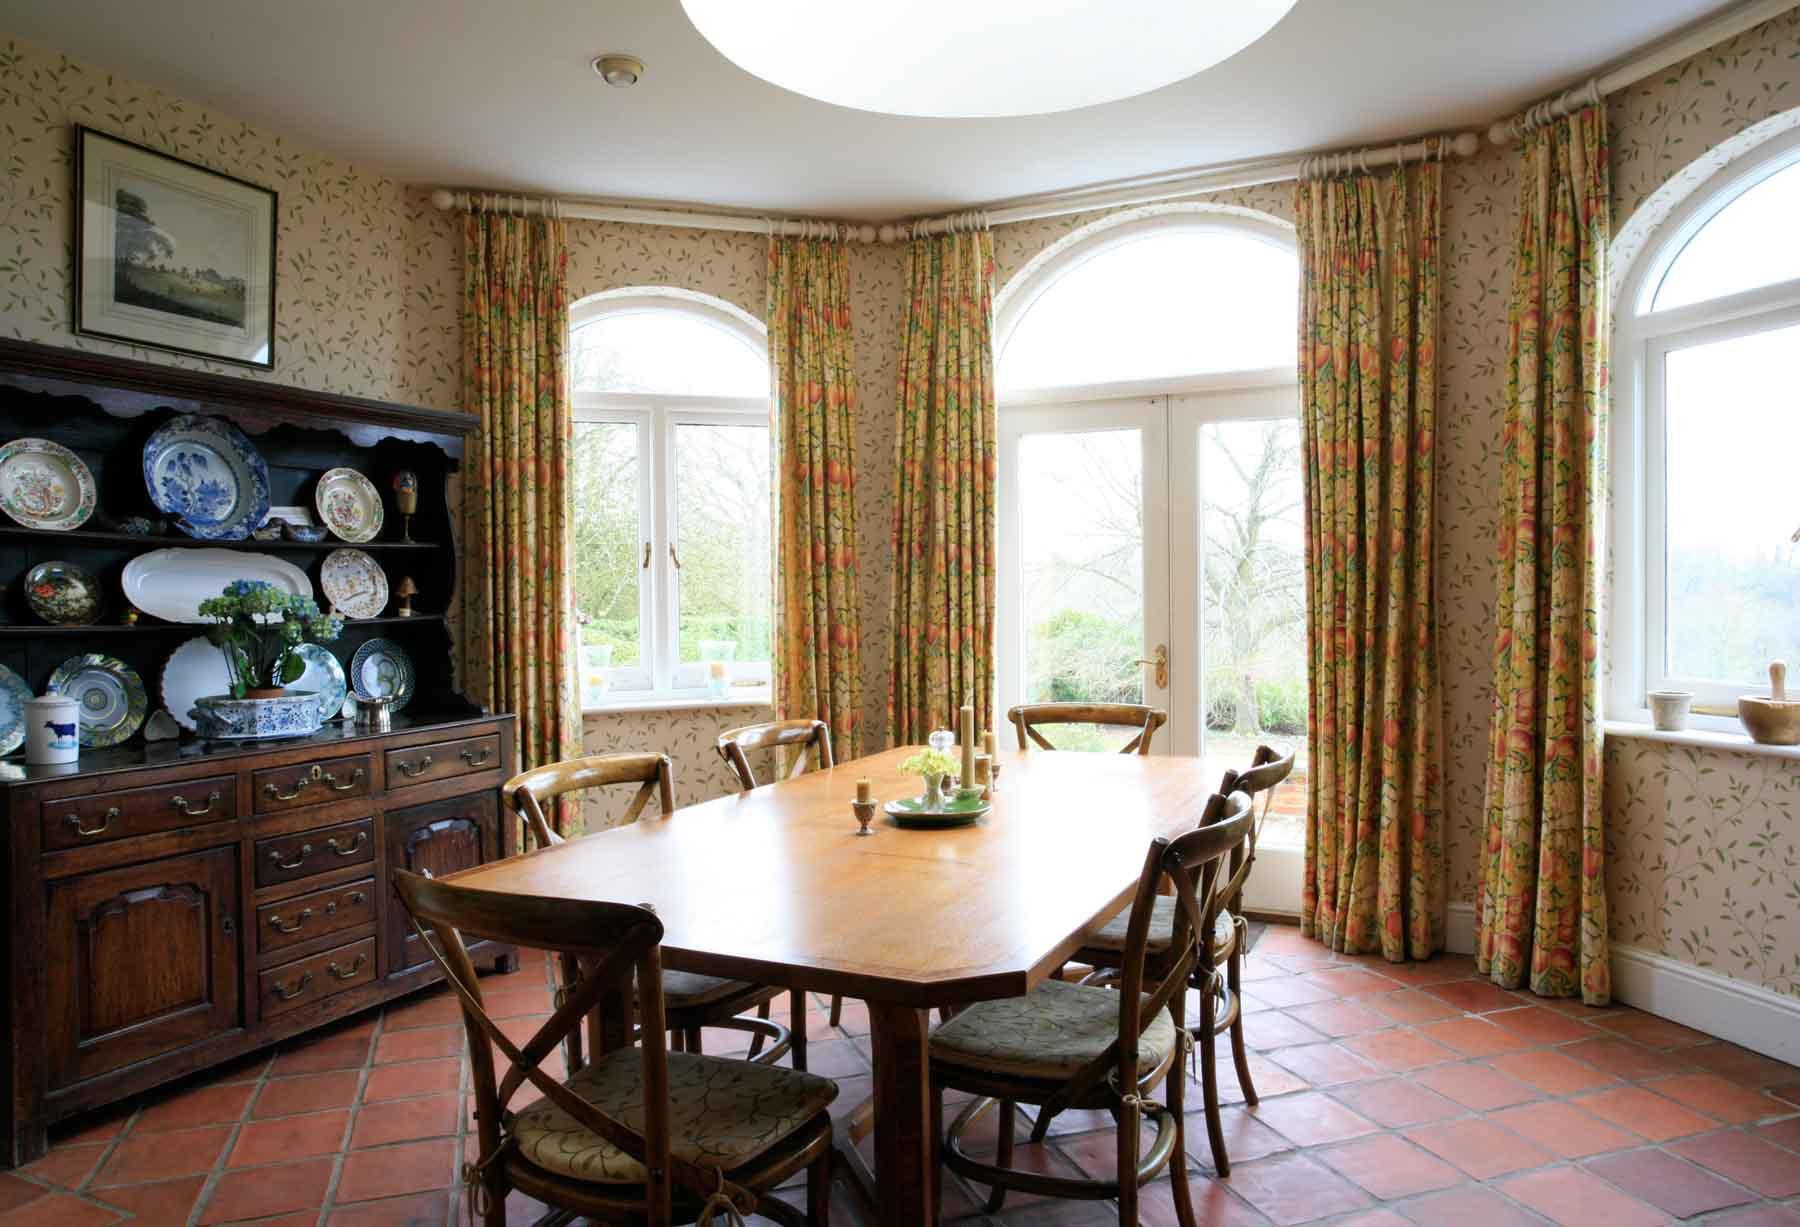 Carol_Fulton_Photography_traditional_interiors__022.jpg